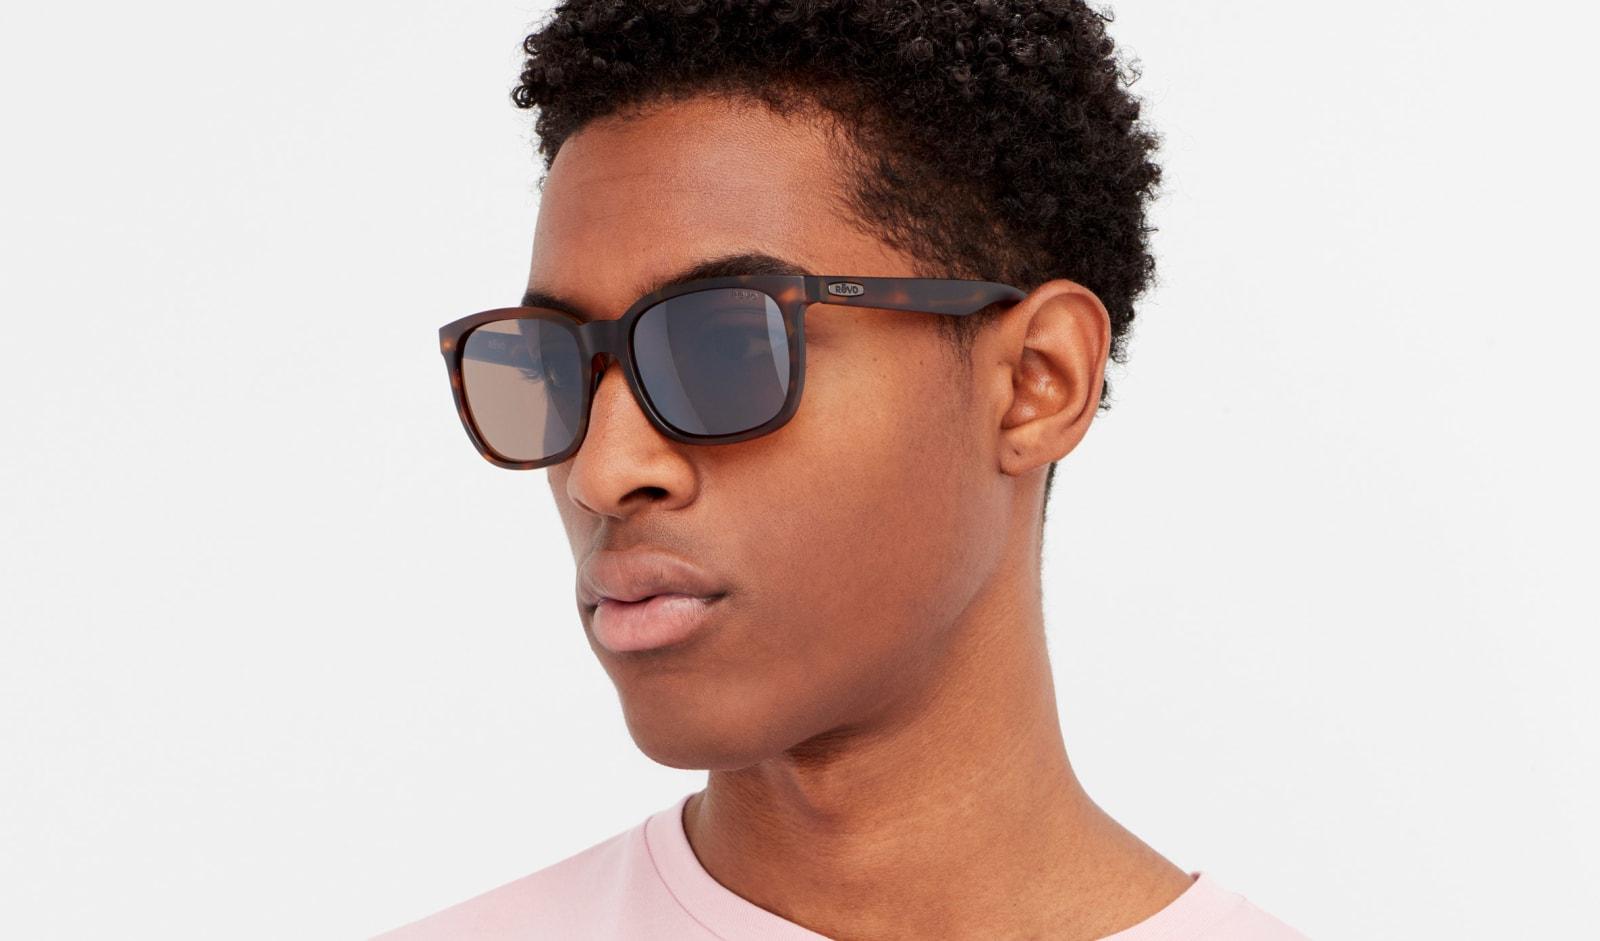 Revo Polarized Sunglasses Slater Modified Rectangle Frame 55 mm